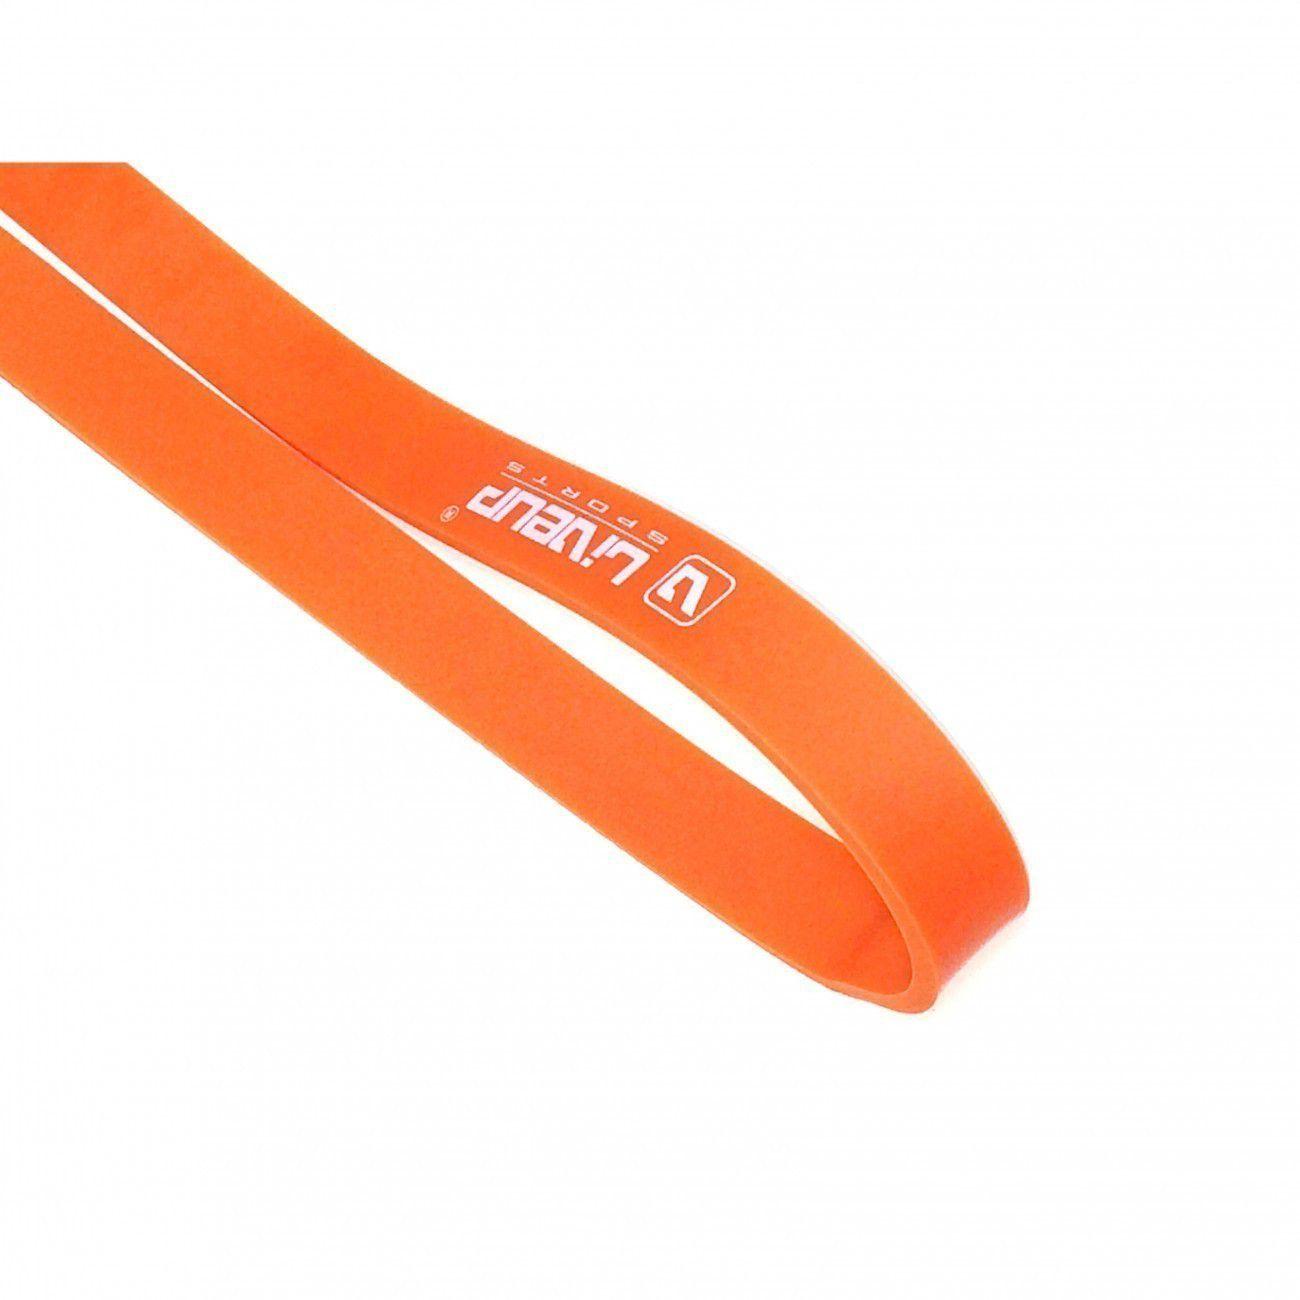 Super Bands 2.1 - Intensidade Leve - 2080x4.5x21mm - Liveup